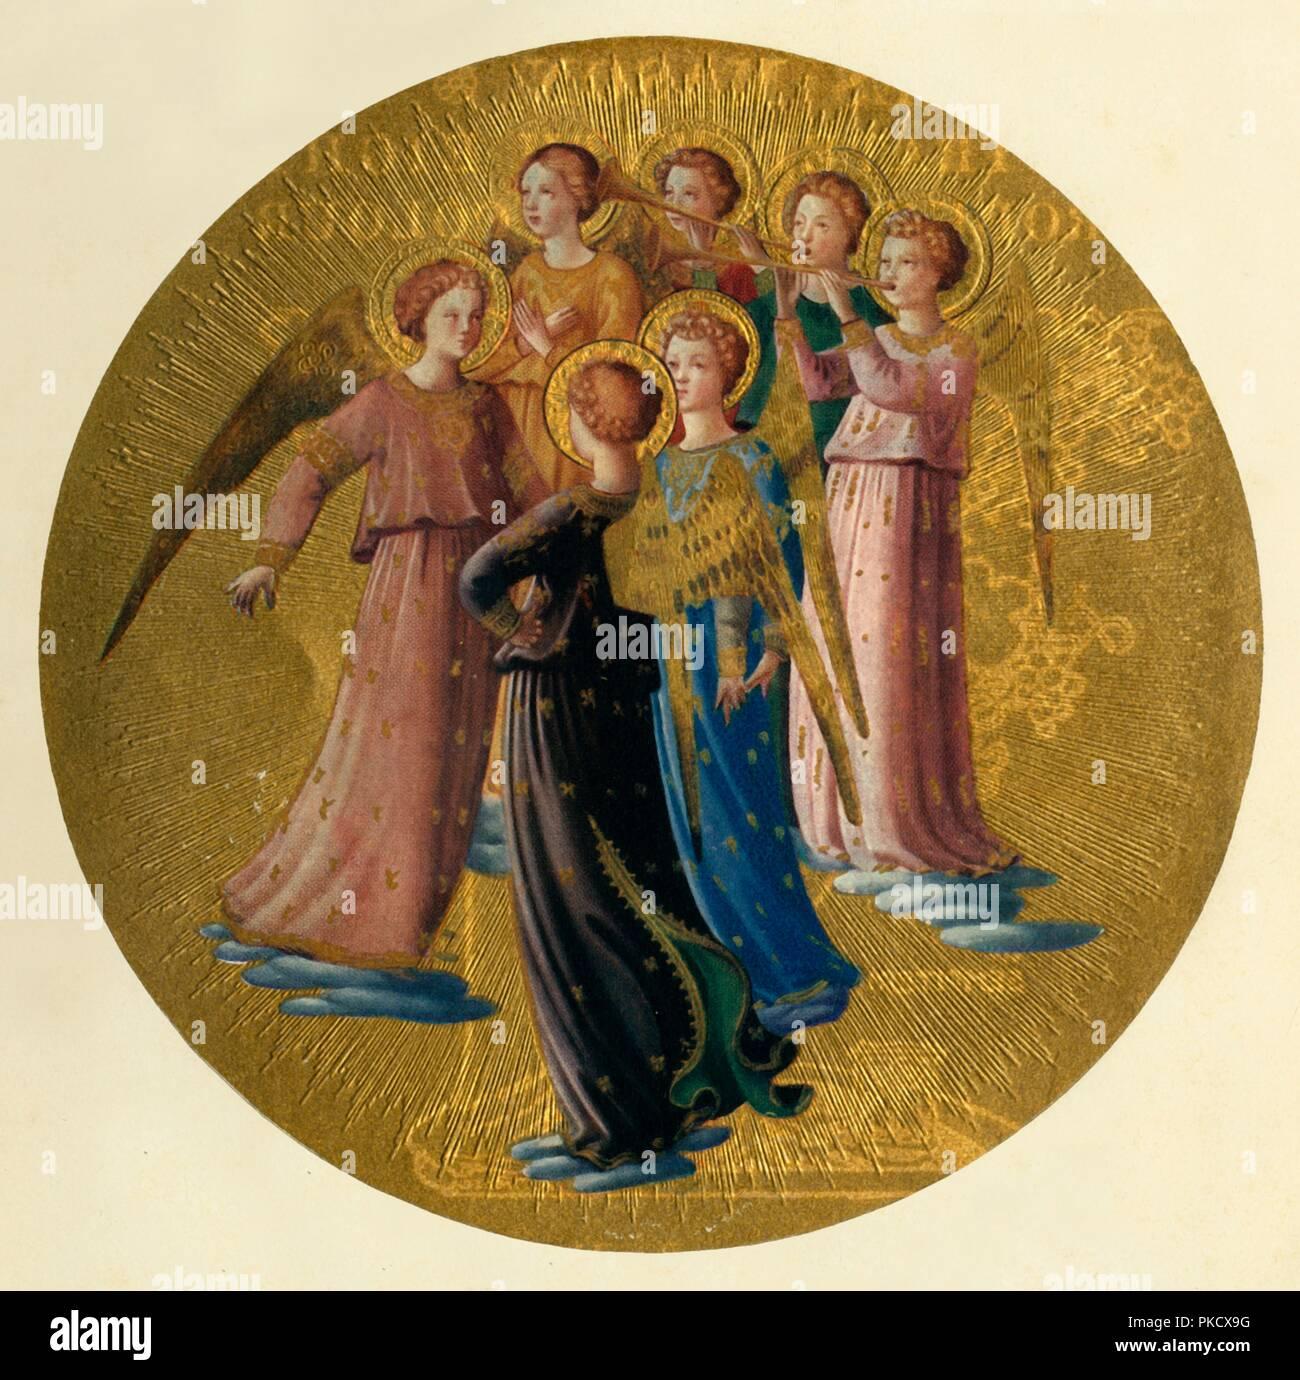 Fra Angelico Angel Immagini e Fotos Stock - Alamy